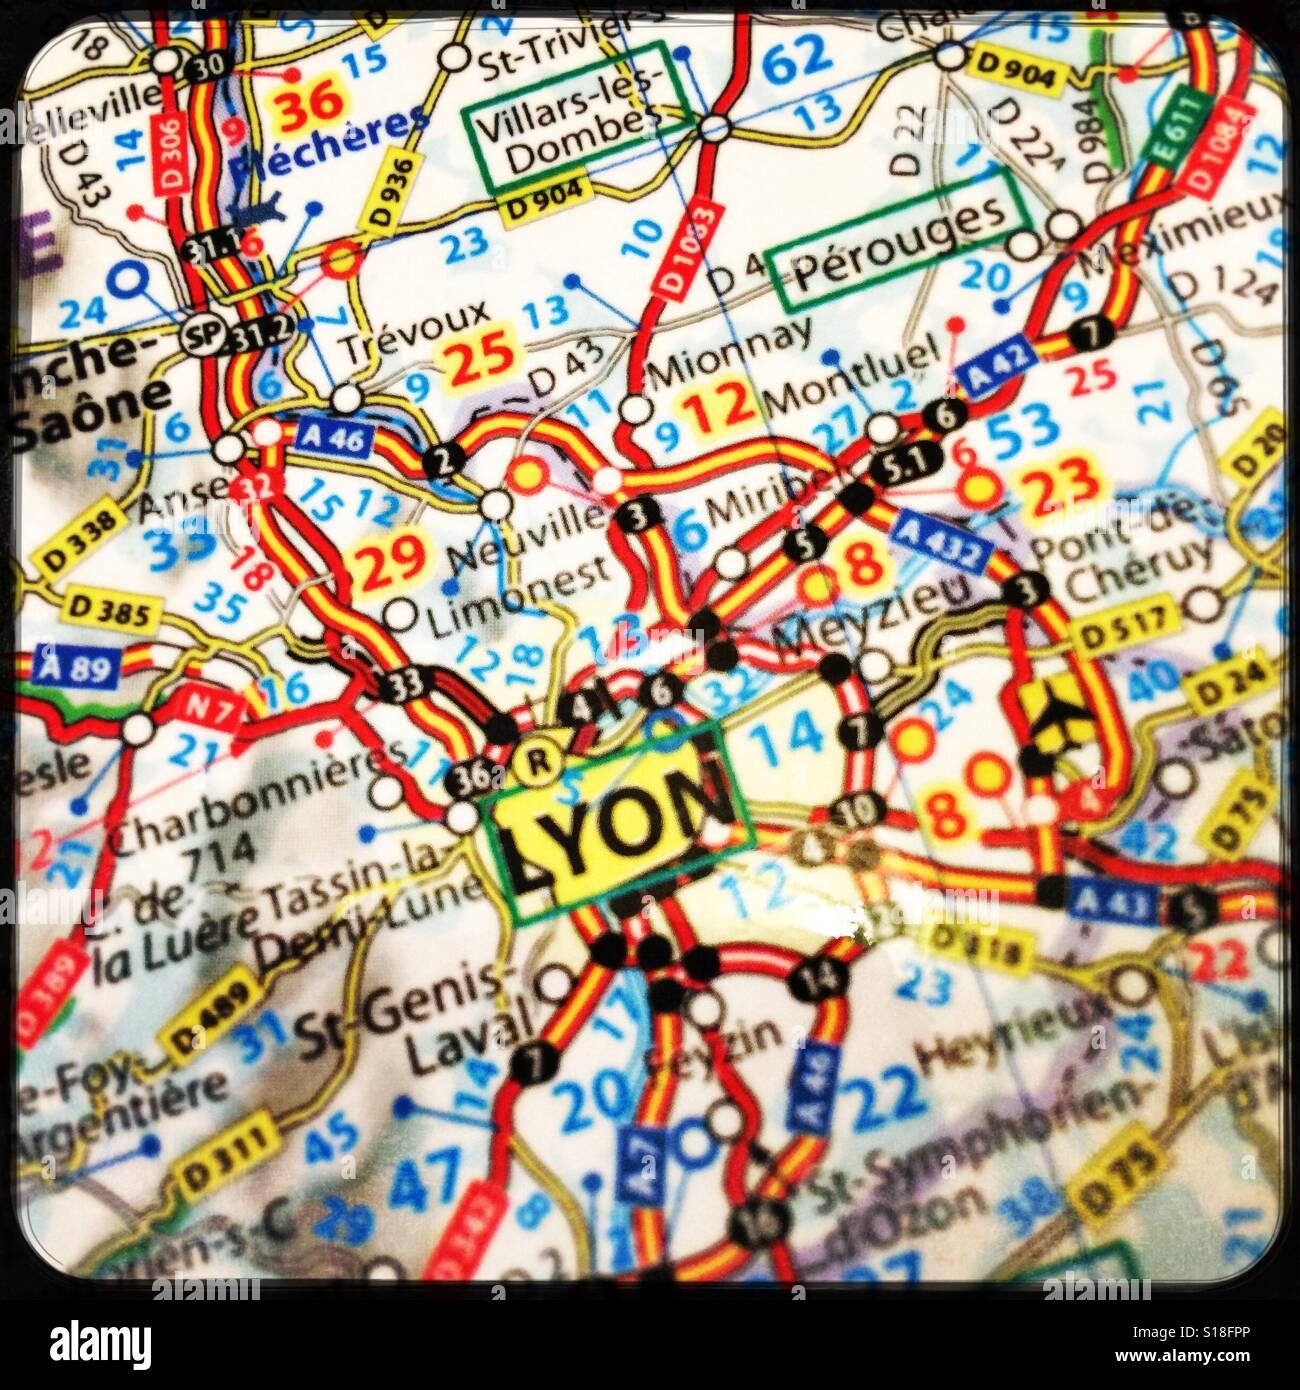 Map Of France Showing Lyon.Map Showing Lyon France Stock Photo 310589294 Alamy